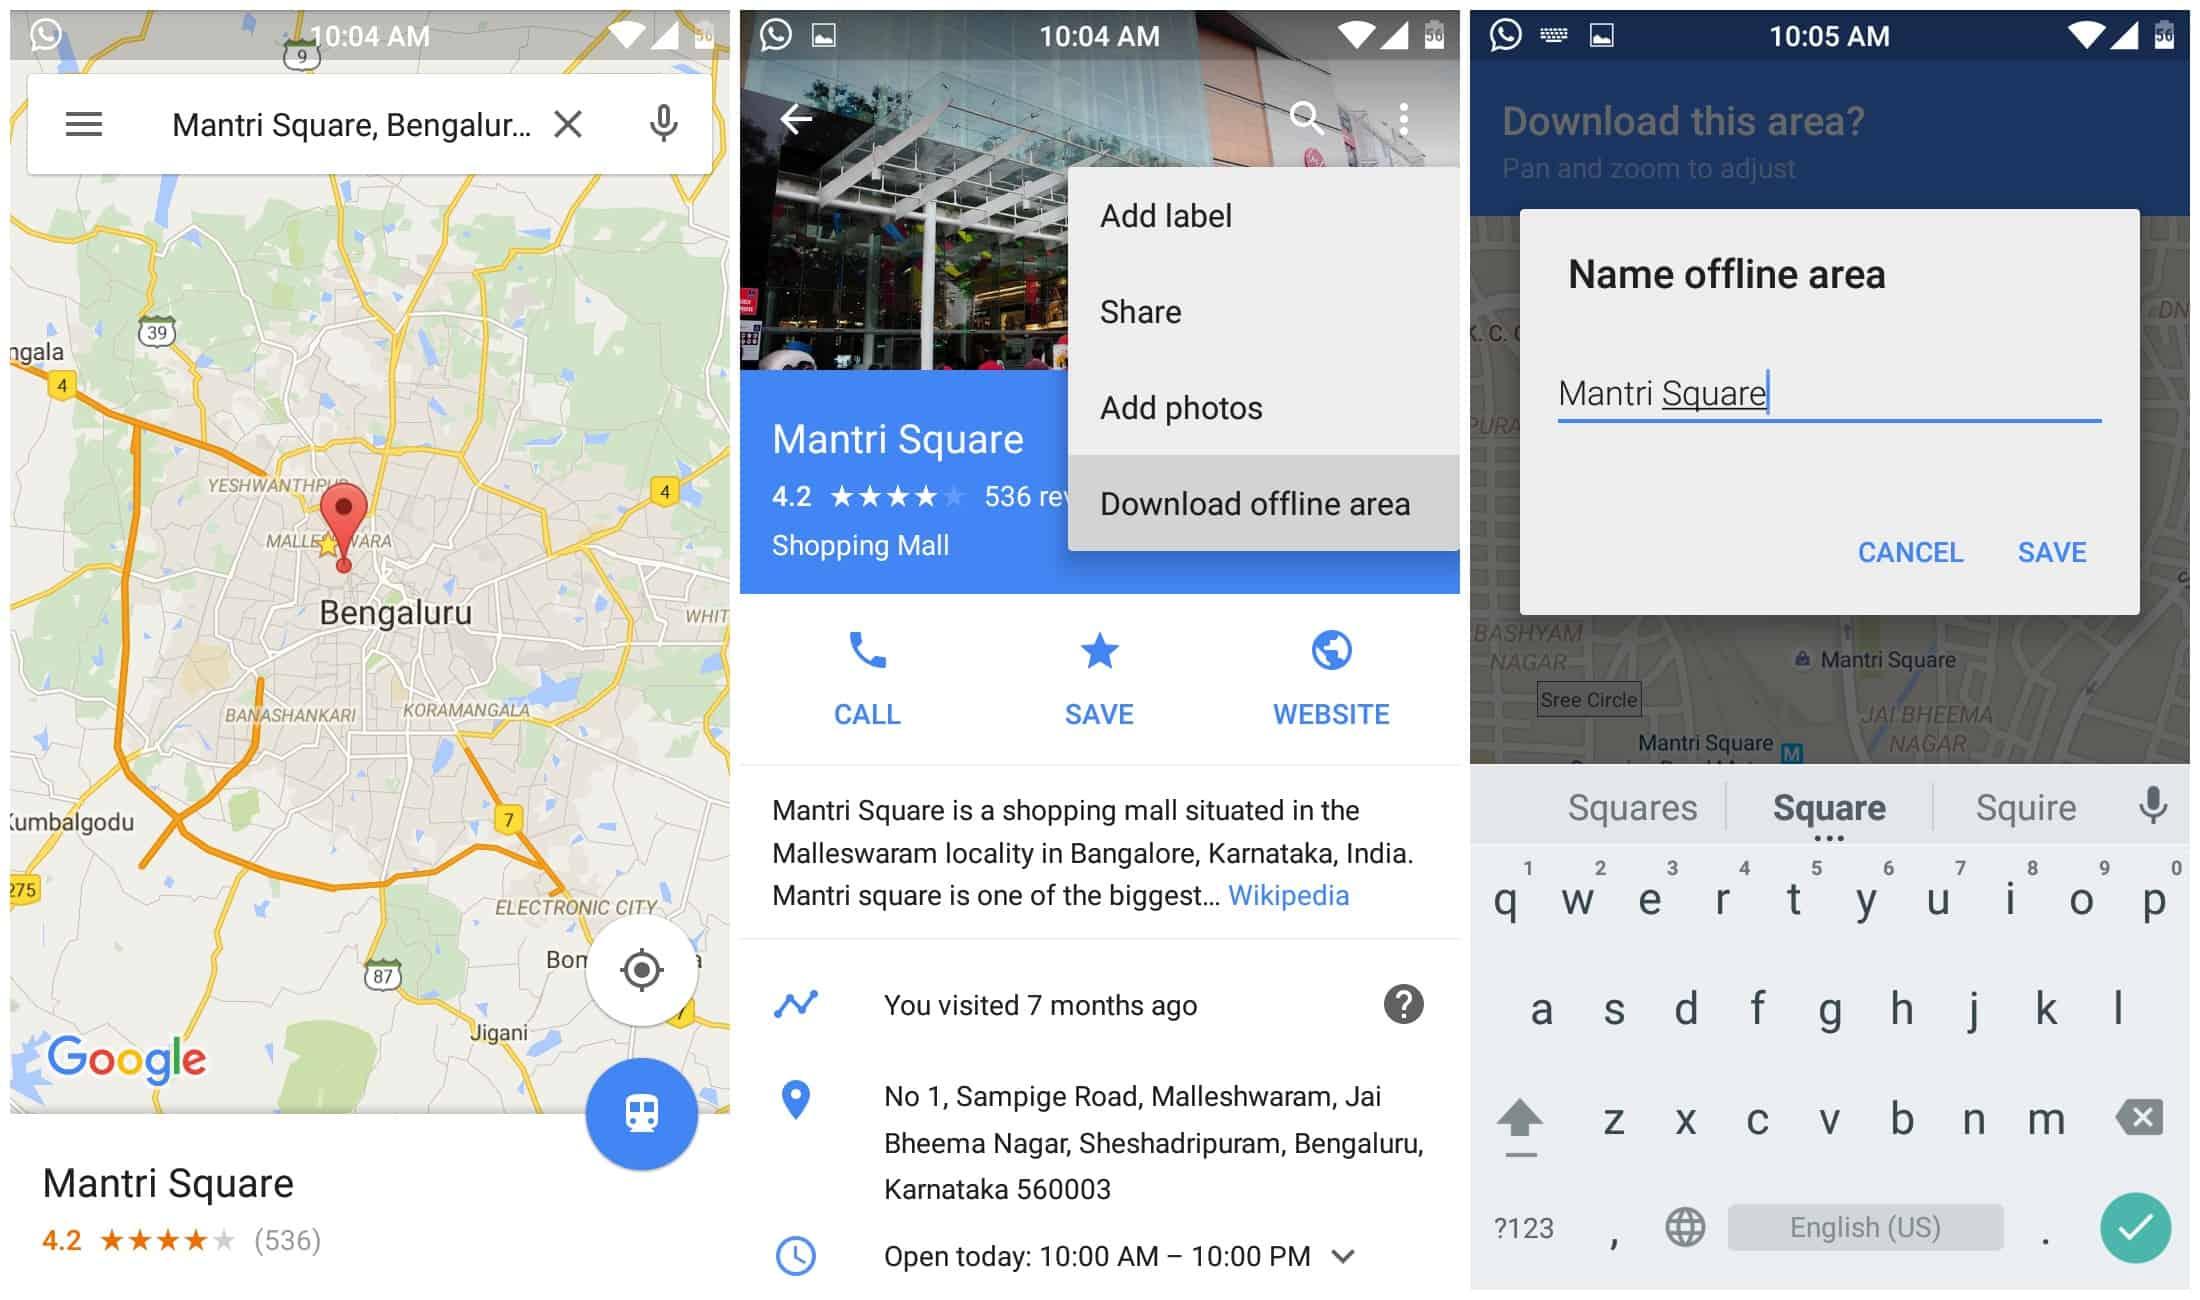 Saving the Offline Area on Google Maps Offline